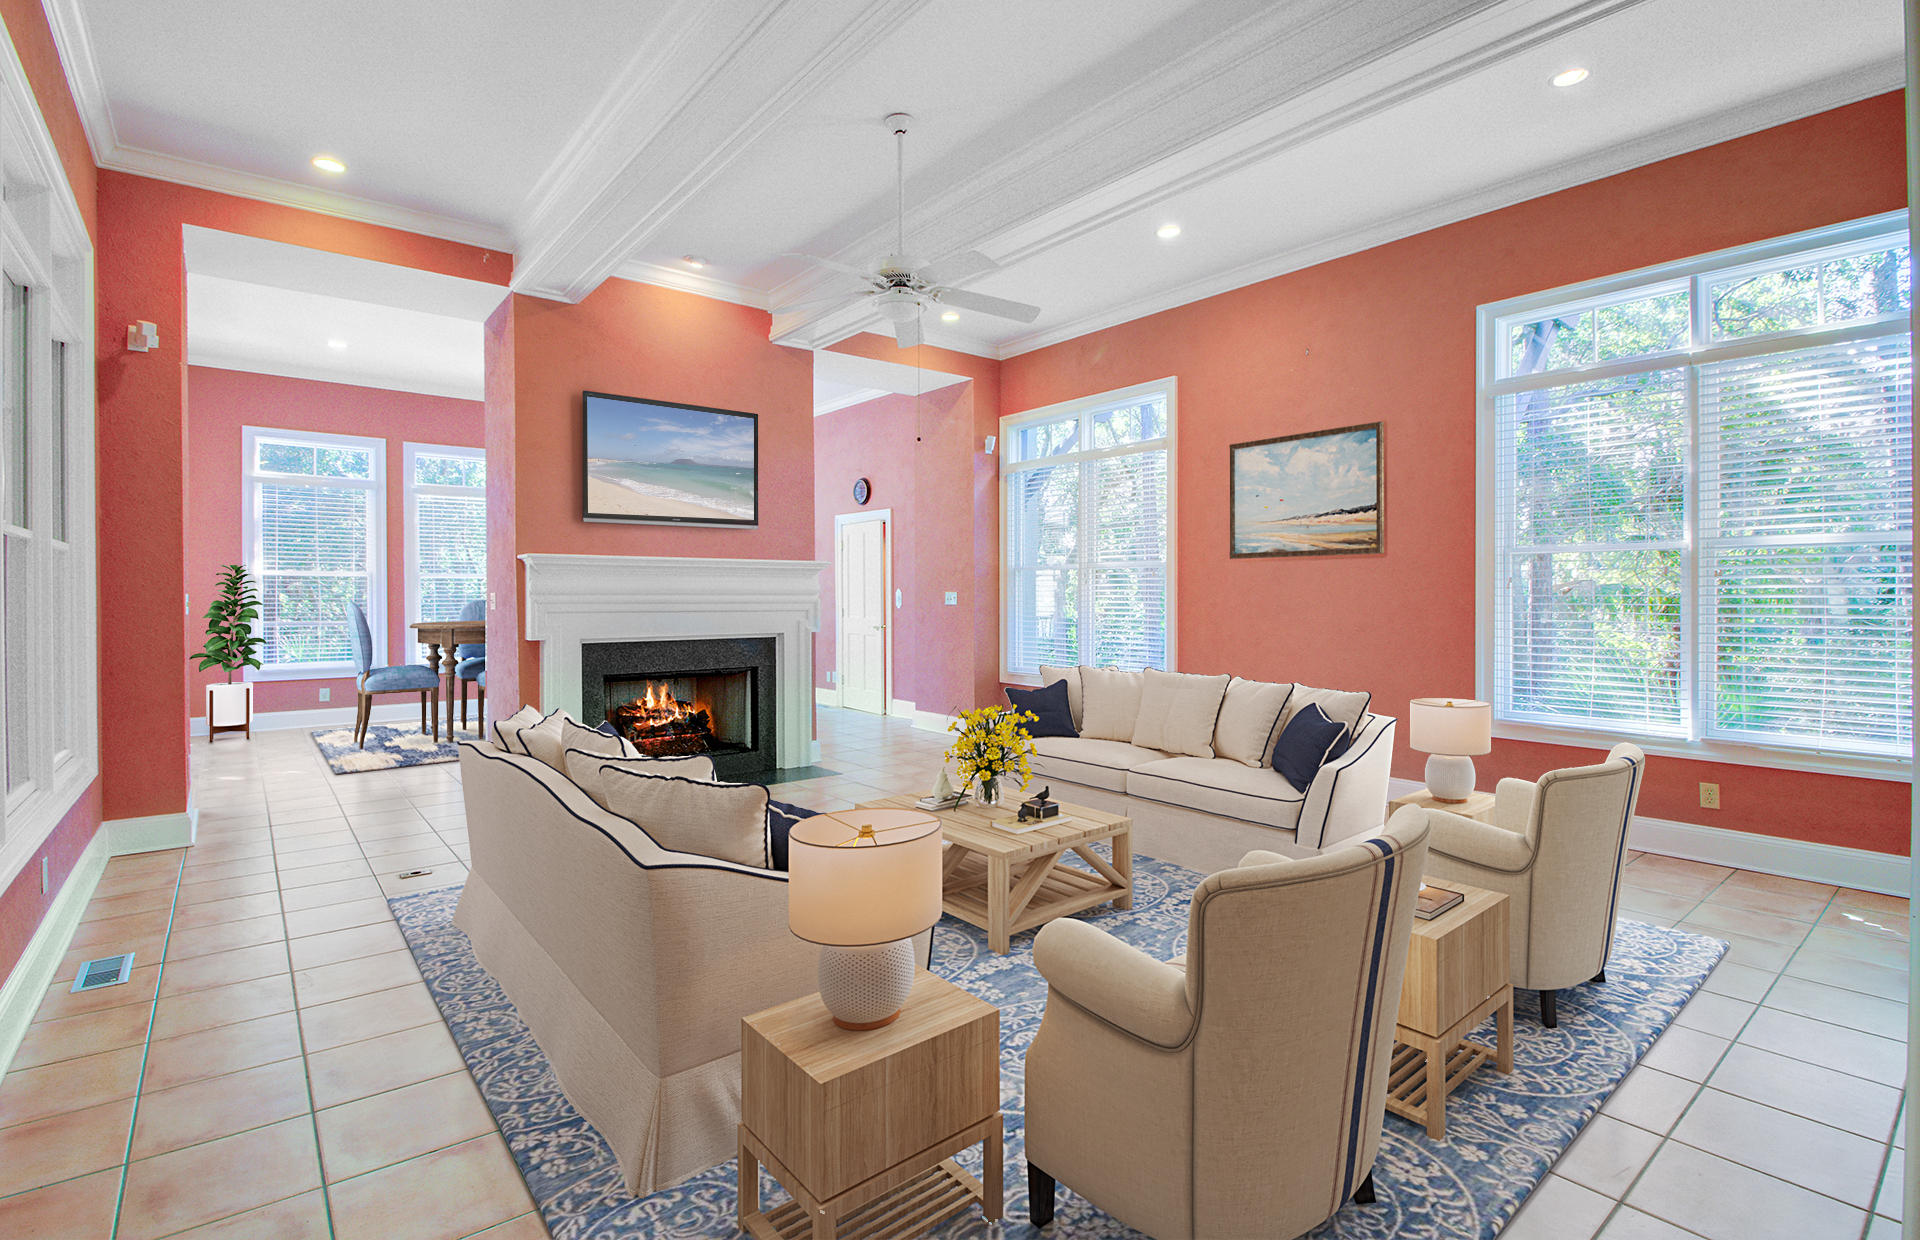 Kiawah Island Homes For Sale - 402 Ocean Oaks, Kiawah Island, SC - 46